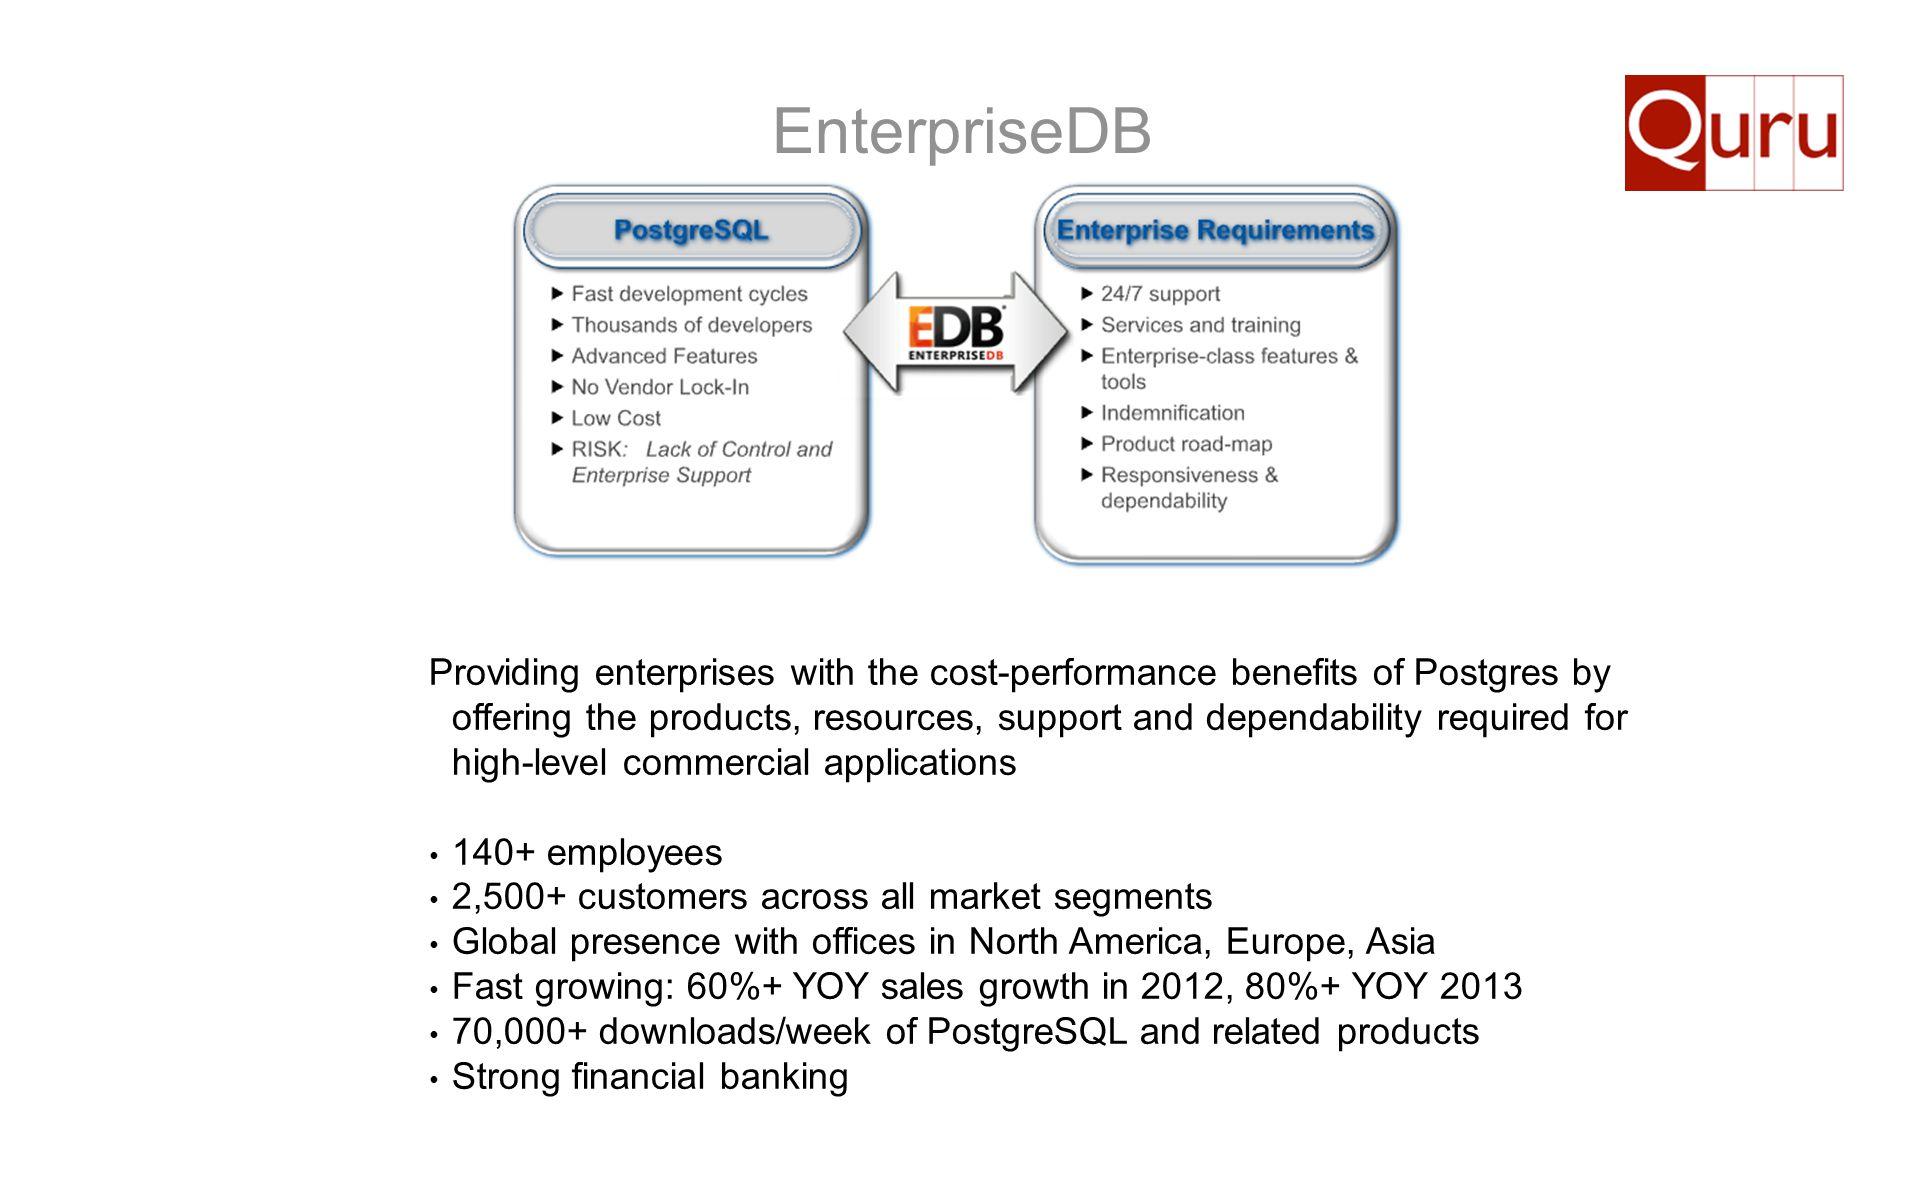 EnterpriseDB Scripts. Platform Management. Leading RHEV partner. Training Partner. Leading edge of the partner channel.